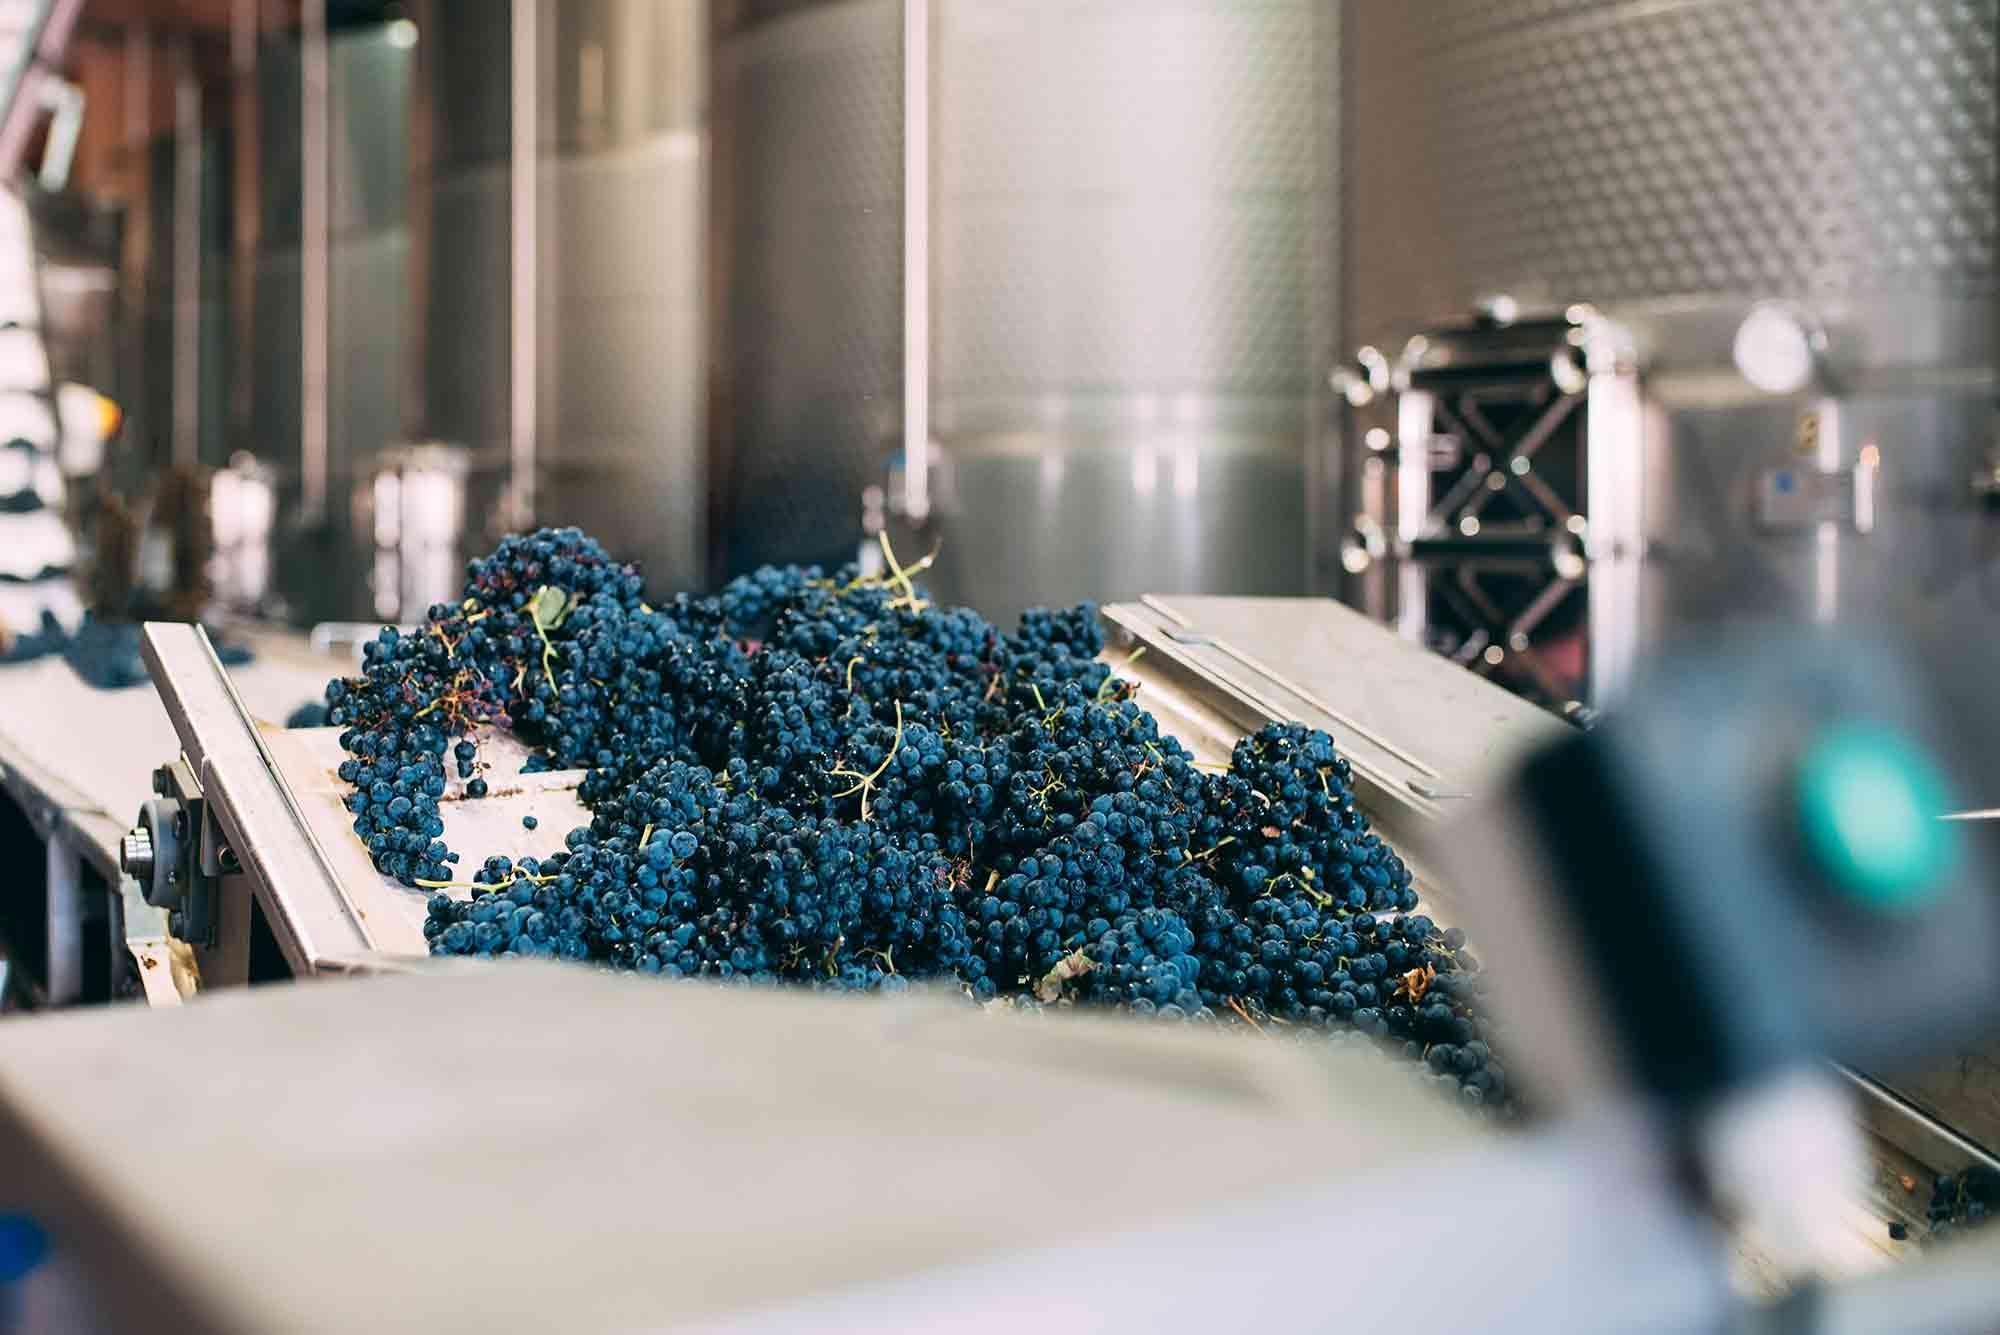 modern winery machine with grapes wine vegan